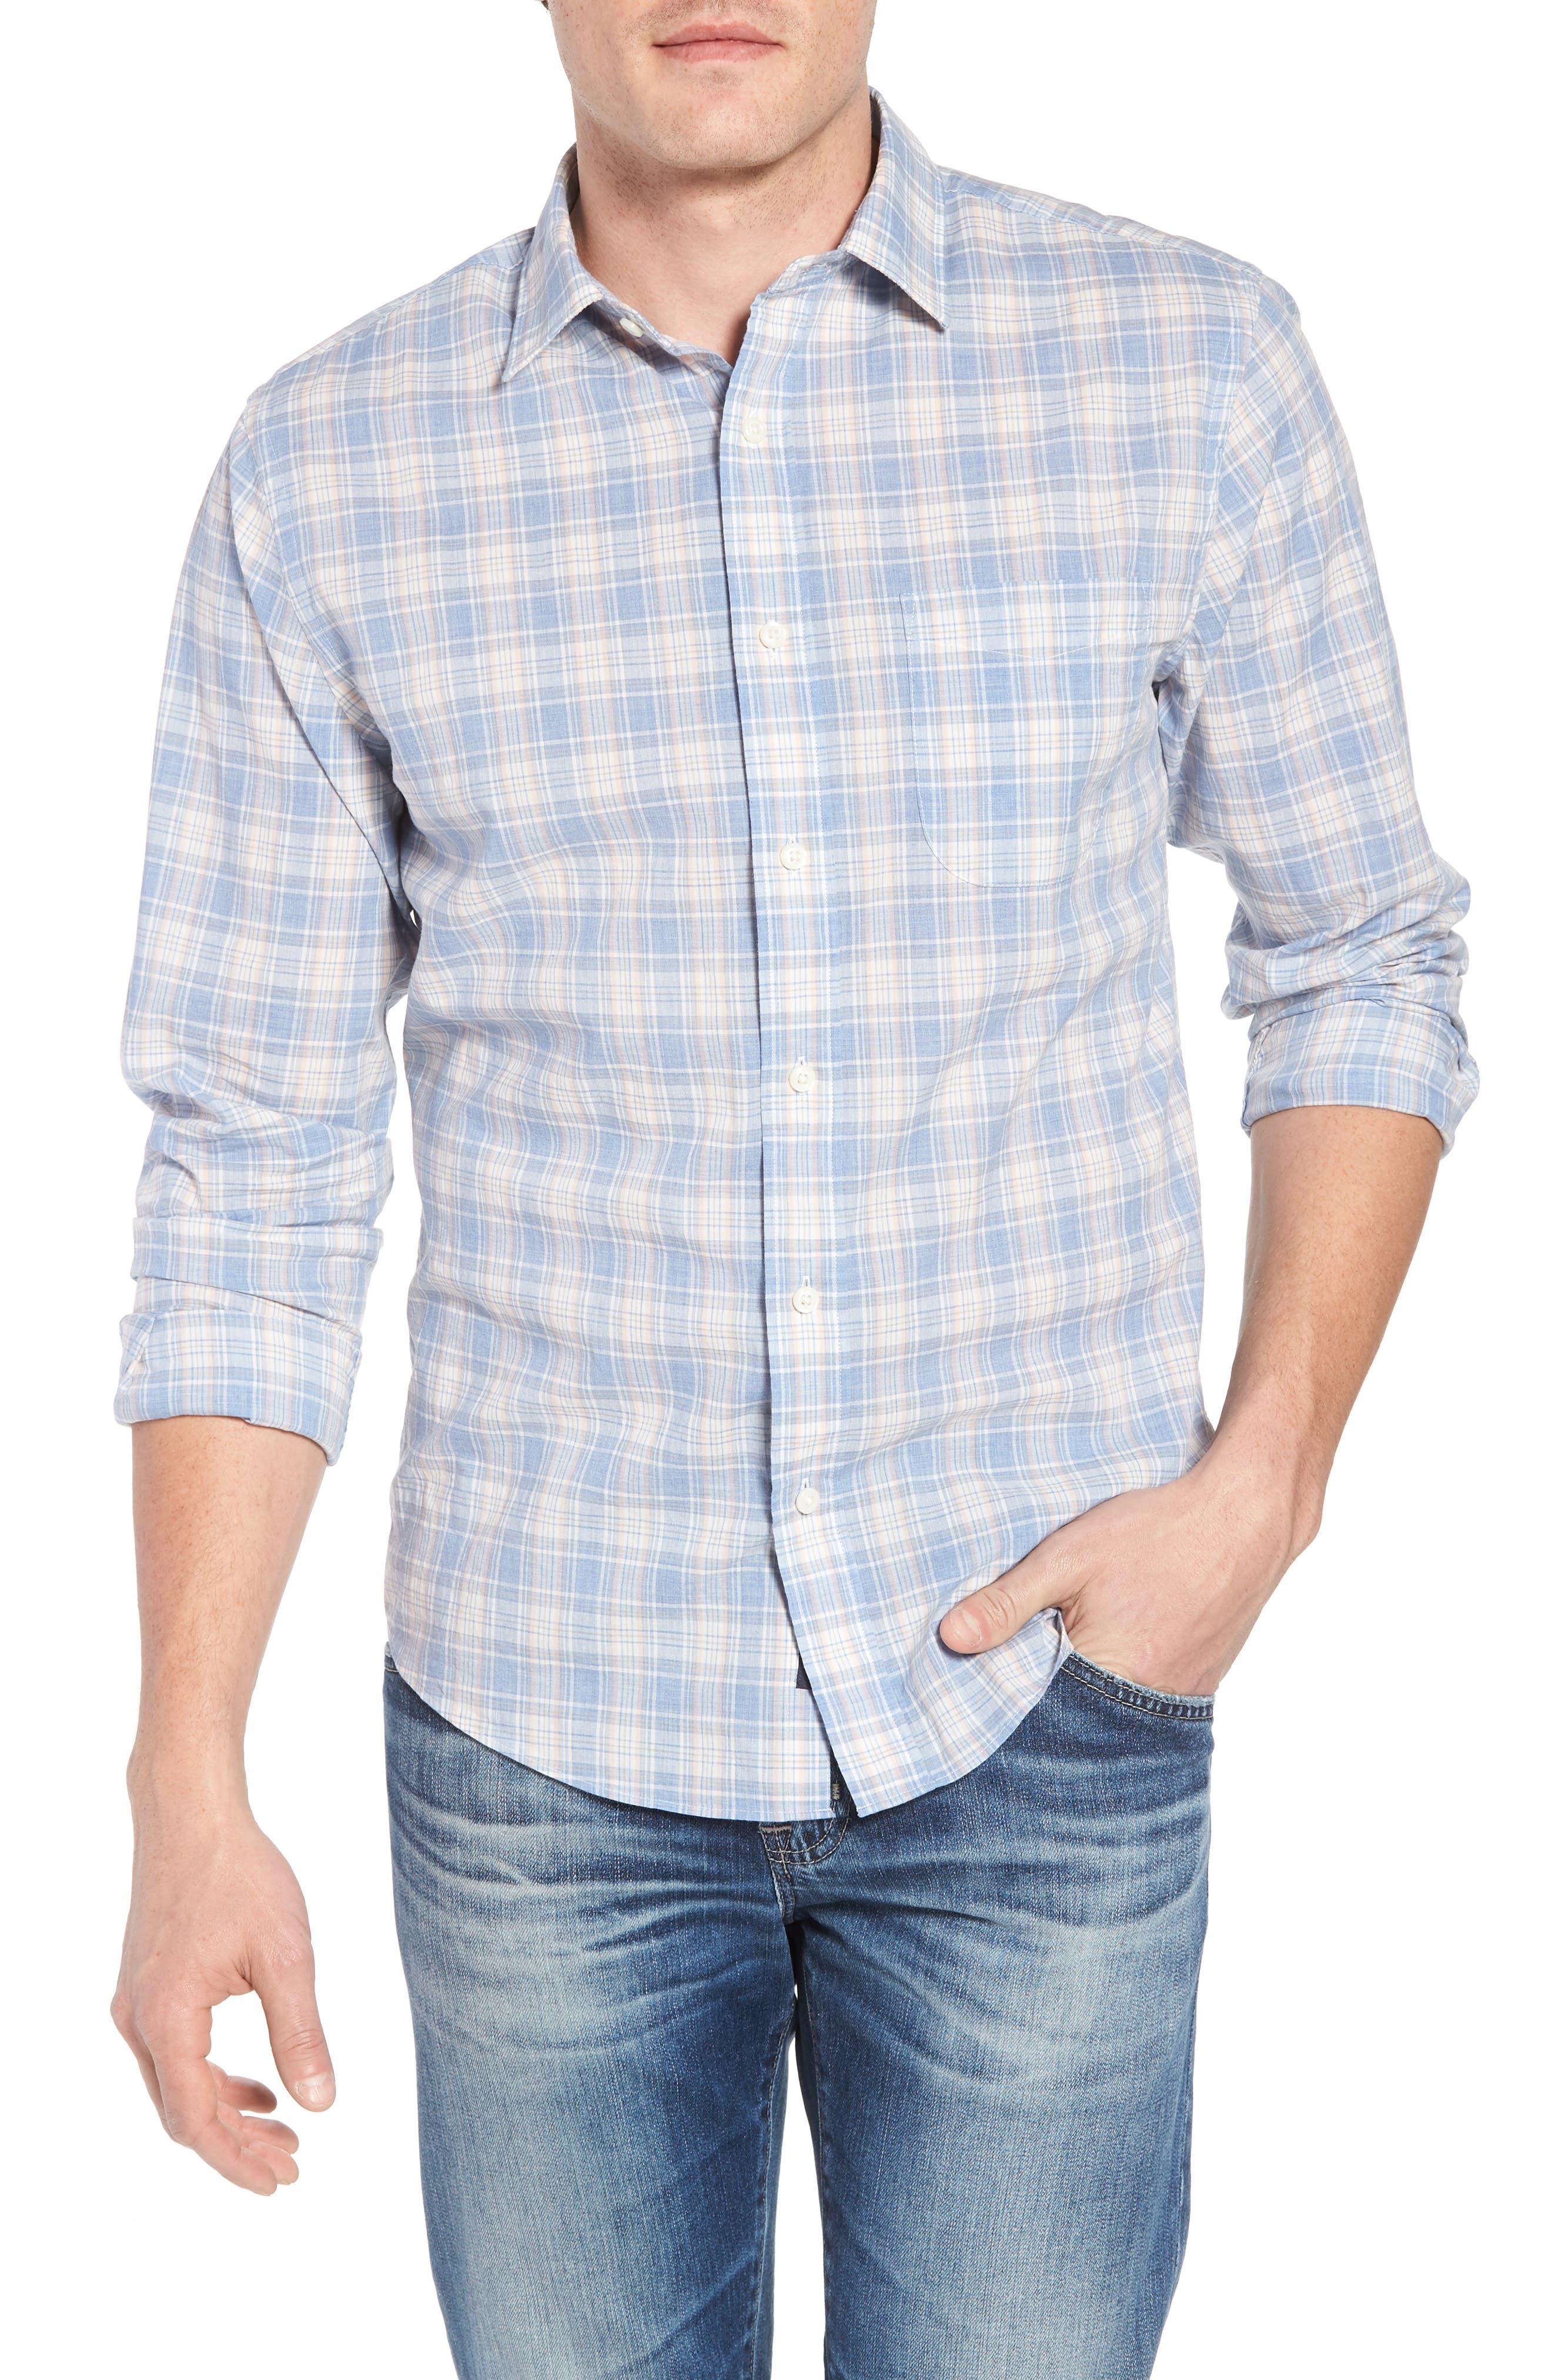 Ventura Plaid Sport Shirt,                             Main thumbnail 1, color,                             BLUE CORAL GREY